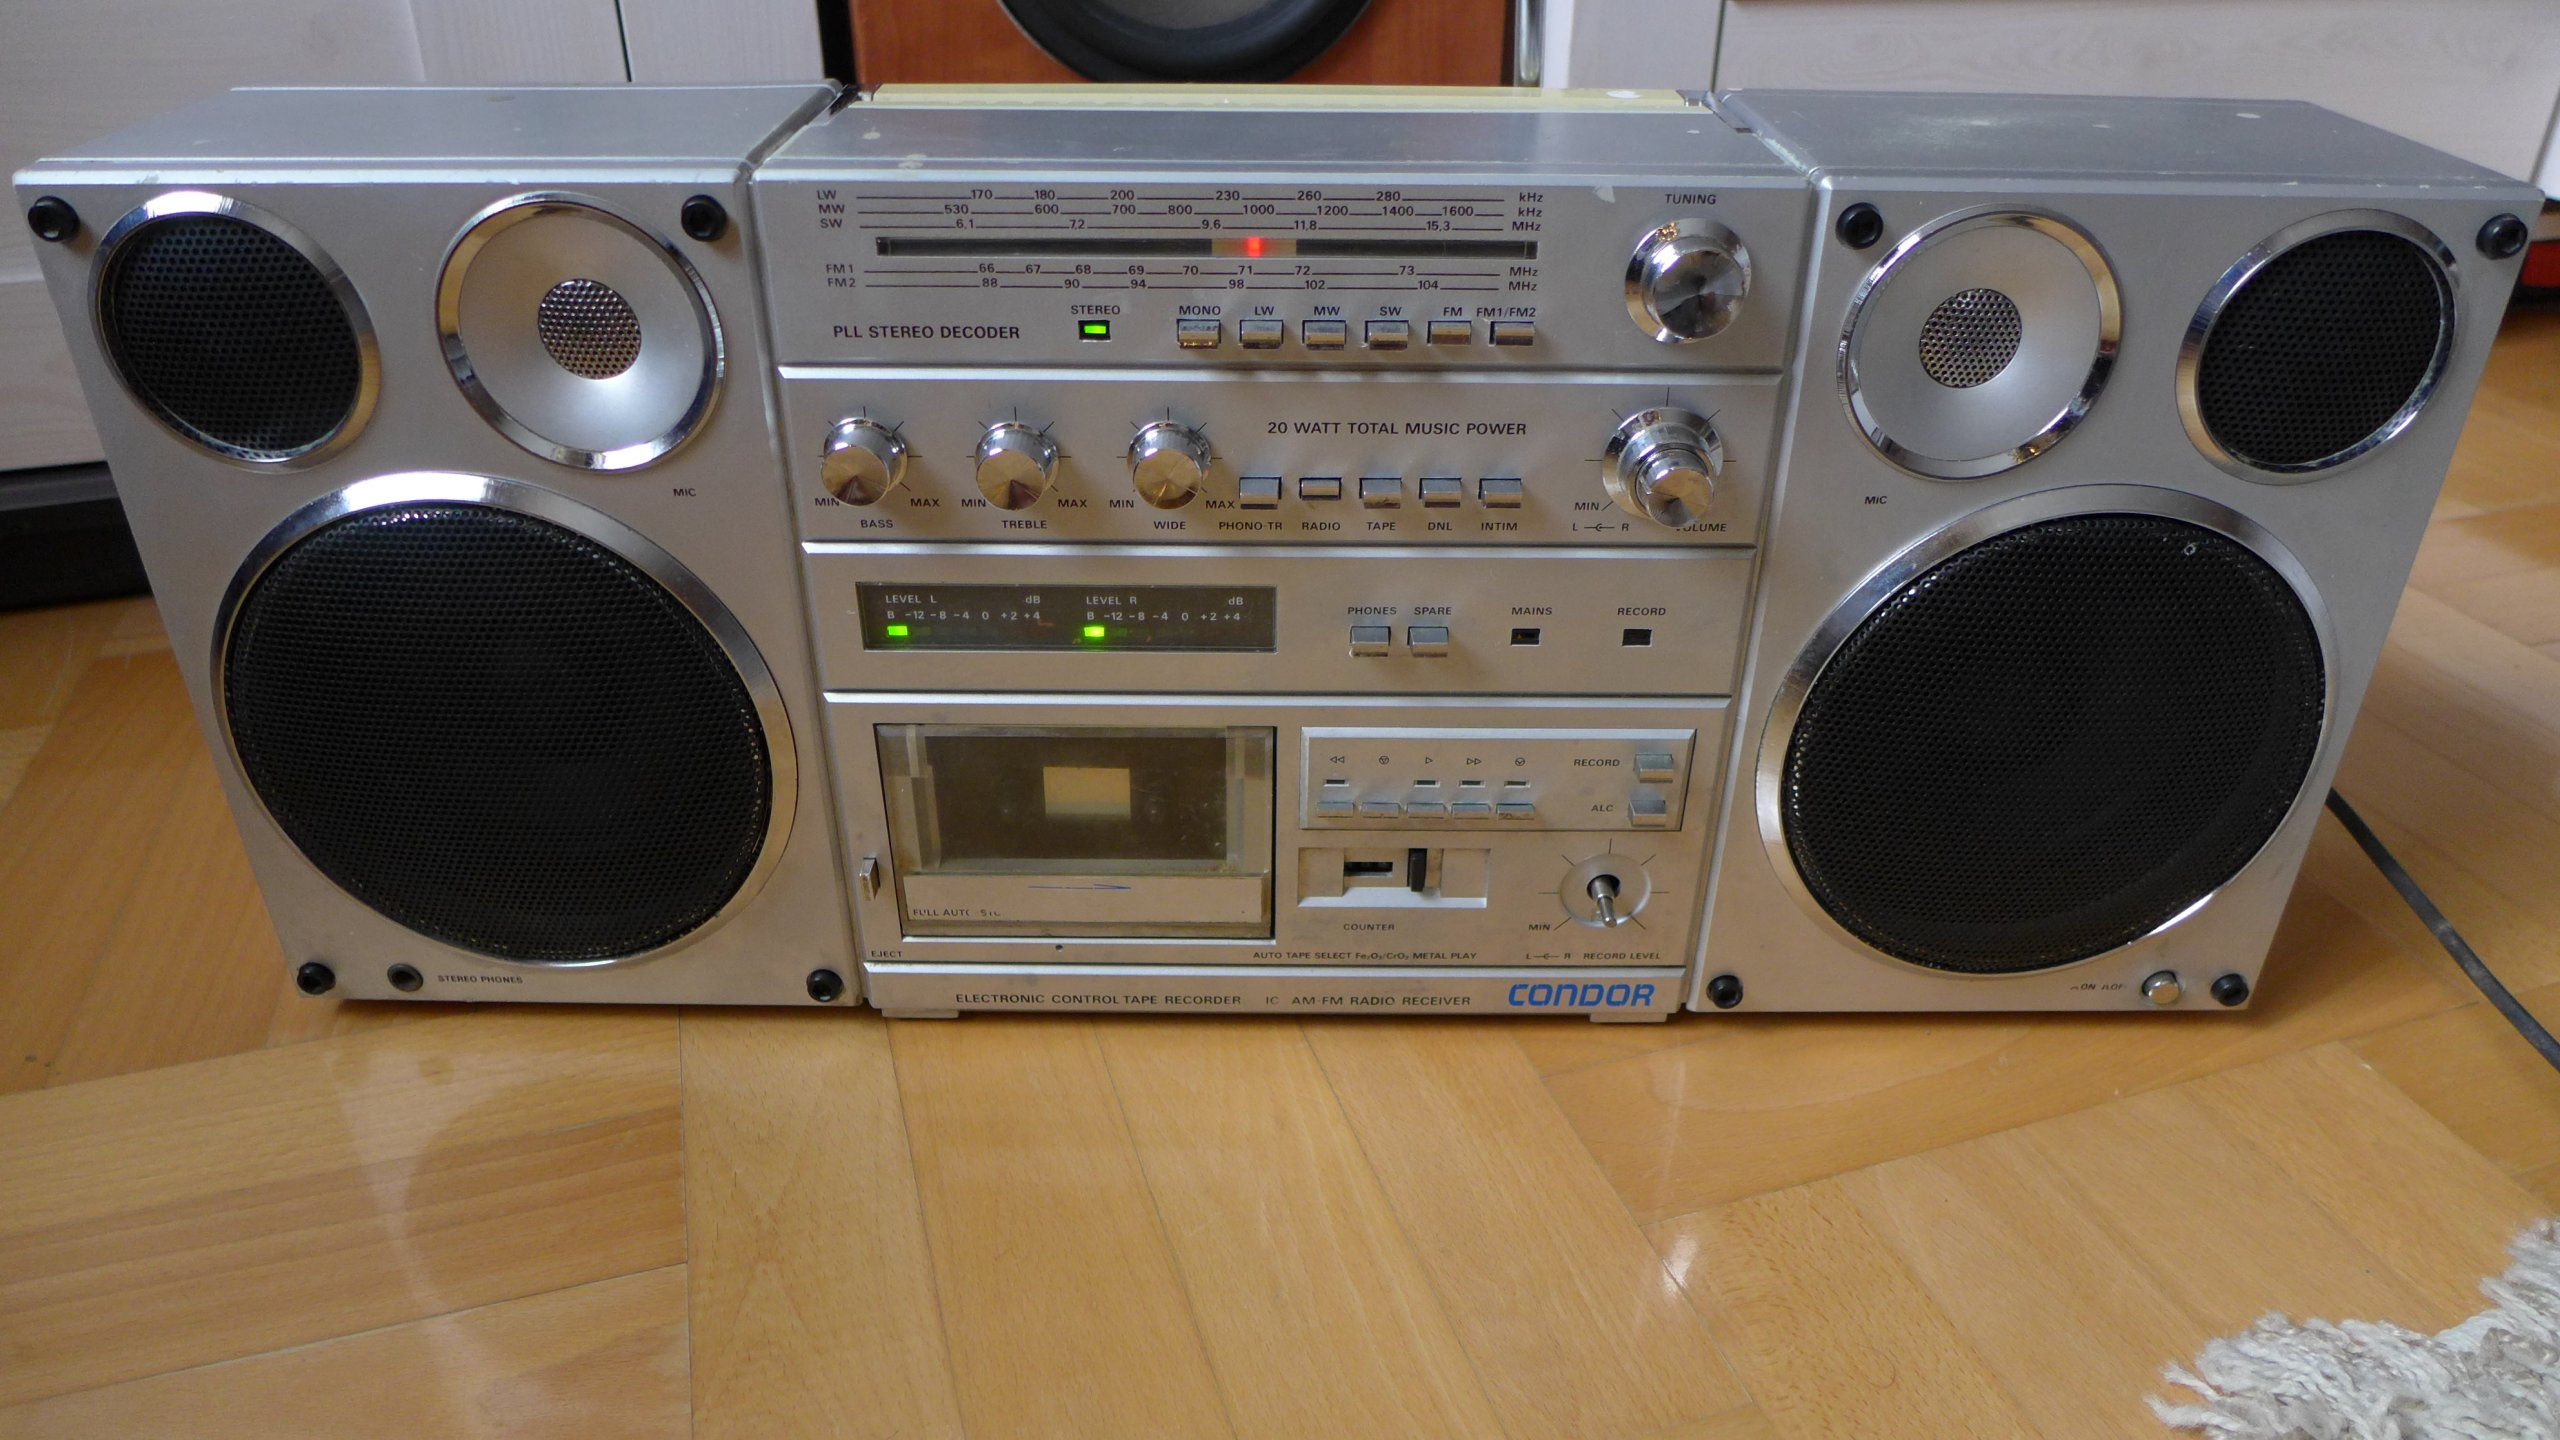 Fantastyczny Radiomagnetofon Condor RM 820S - 7145431869 - oficjalne archiwum RT14